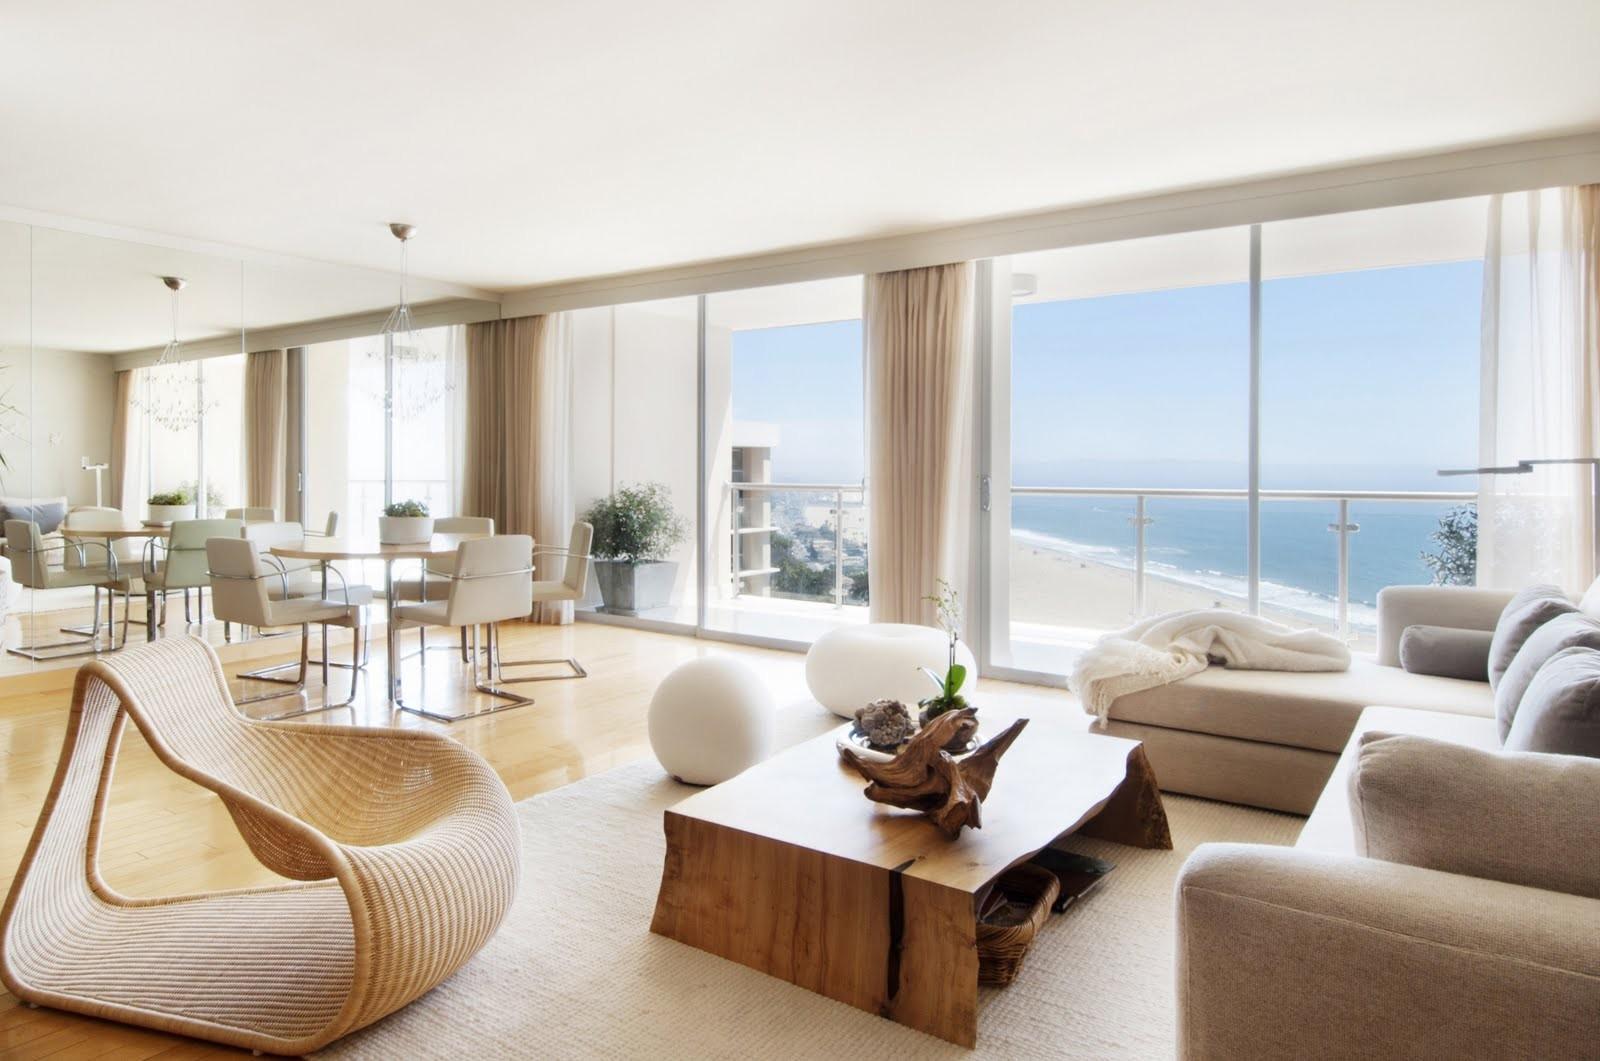 50 instant ideas fof living room colors inspiration | Hawk Haven